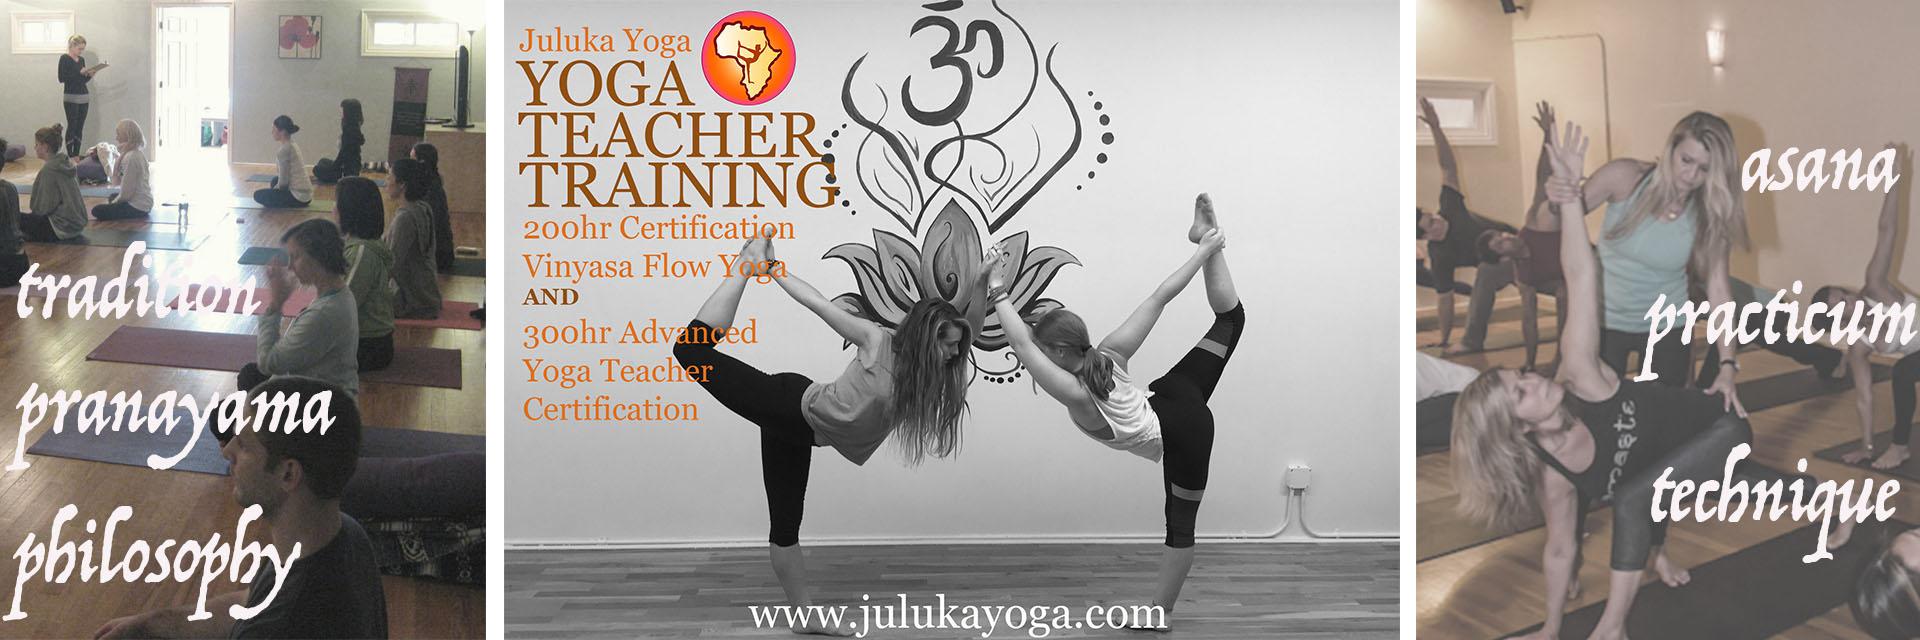 Yoga teacher trainer program at juluka yoga juluka yoga studio xflitez Gallery